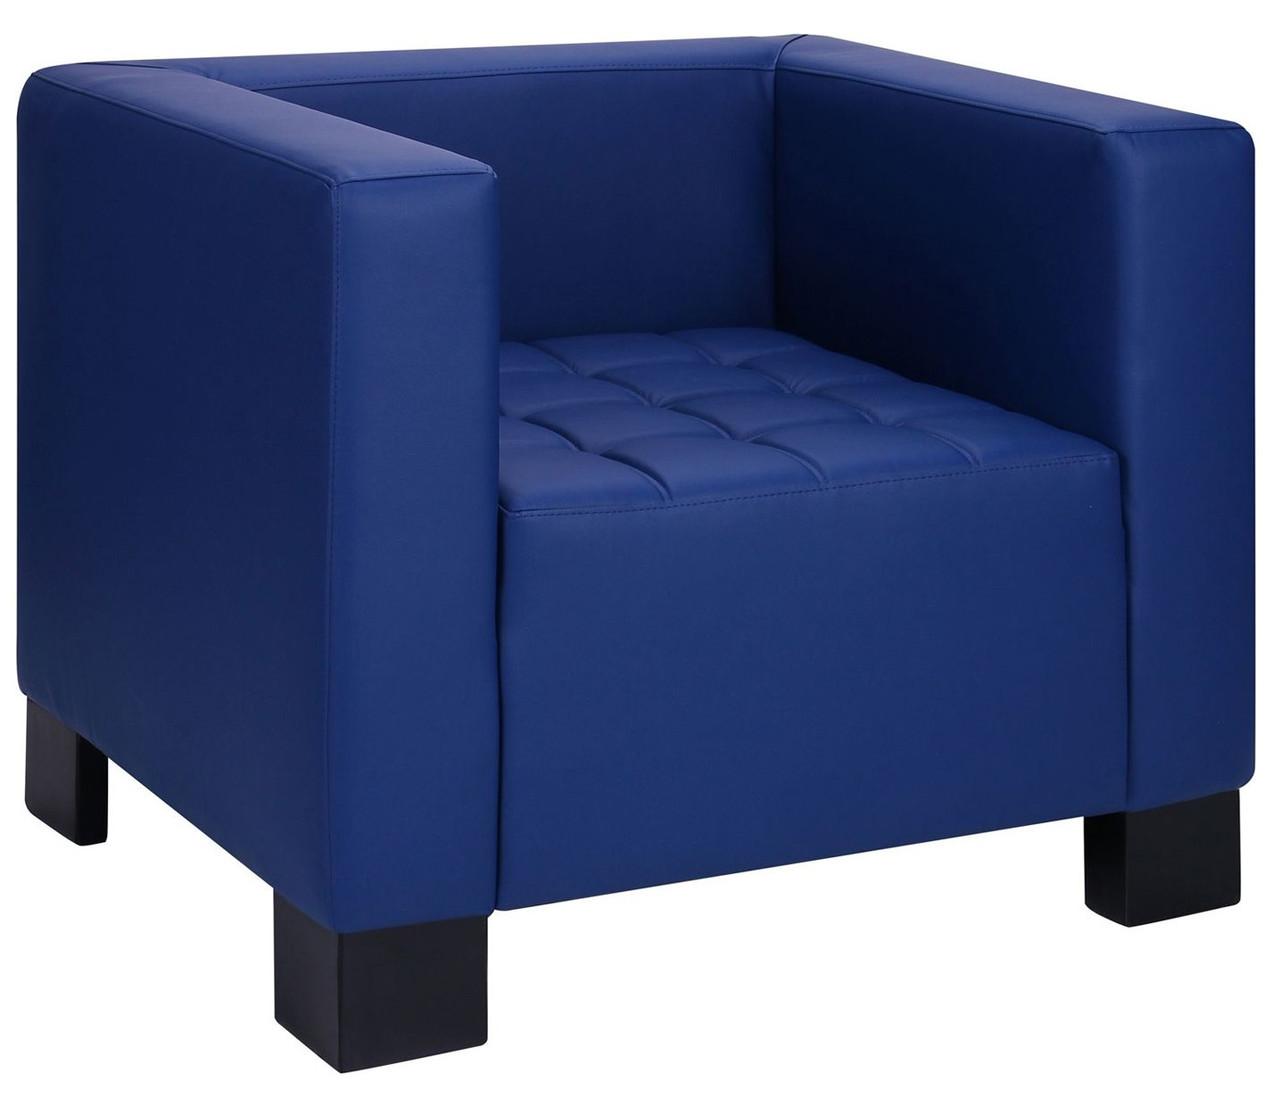 Кресло Кристалл 0,9 Неаполь N-22 ТМ АМФ